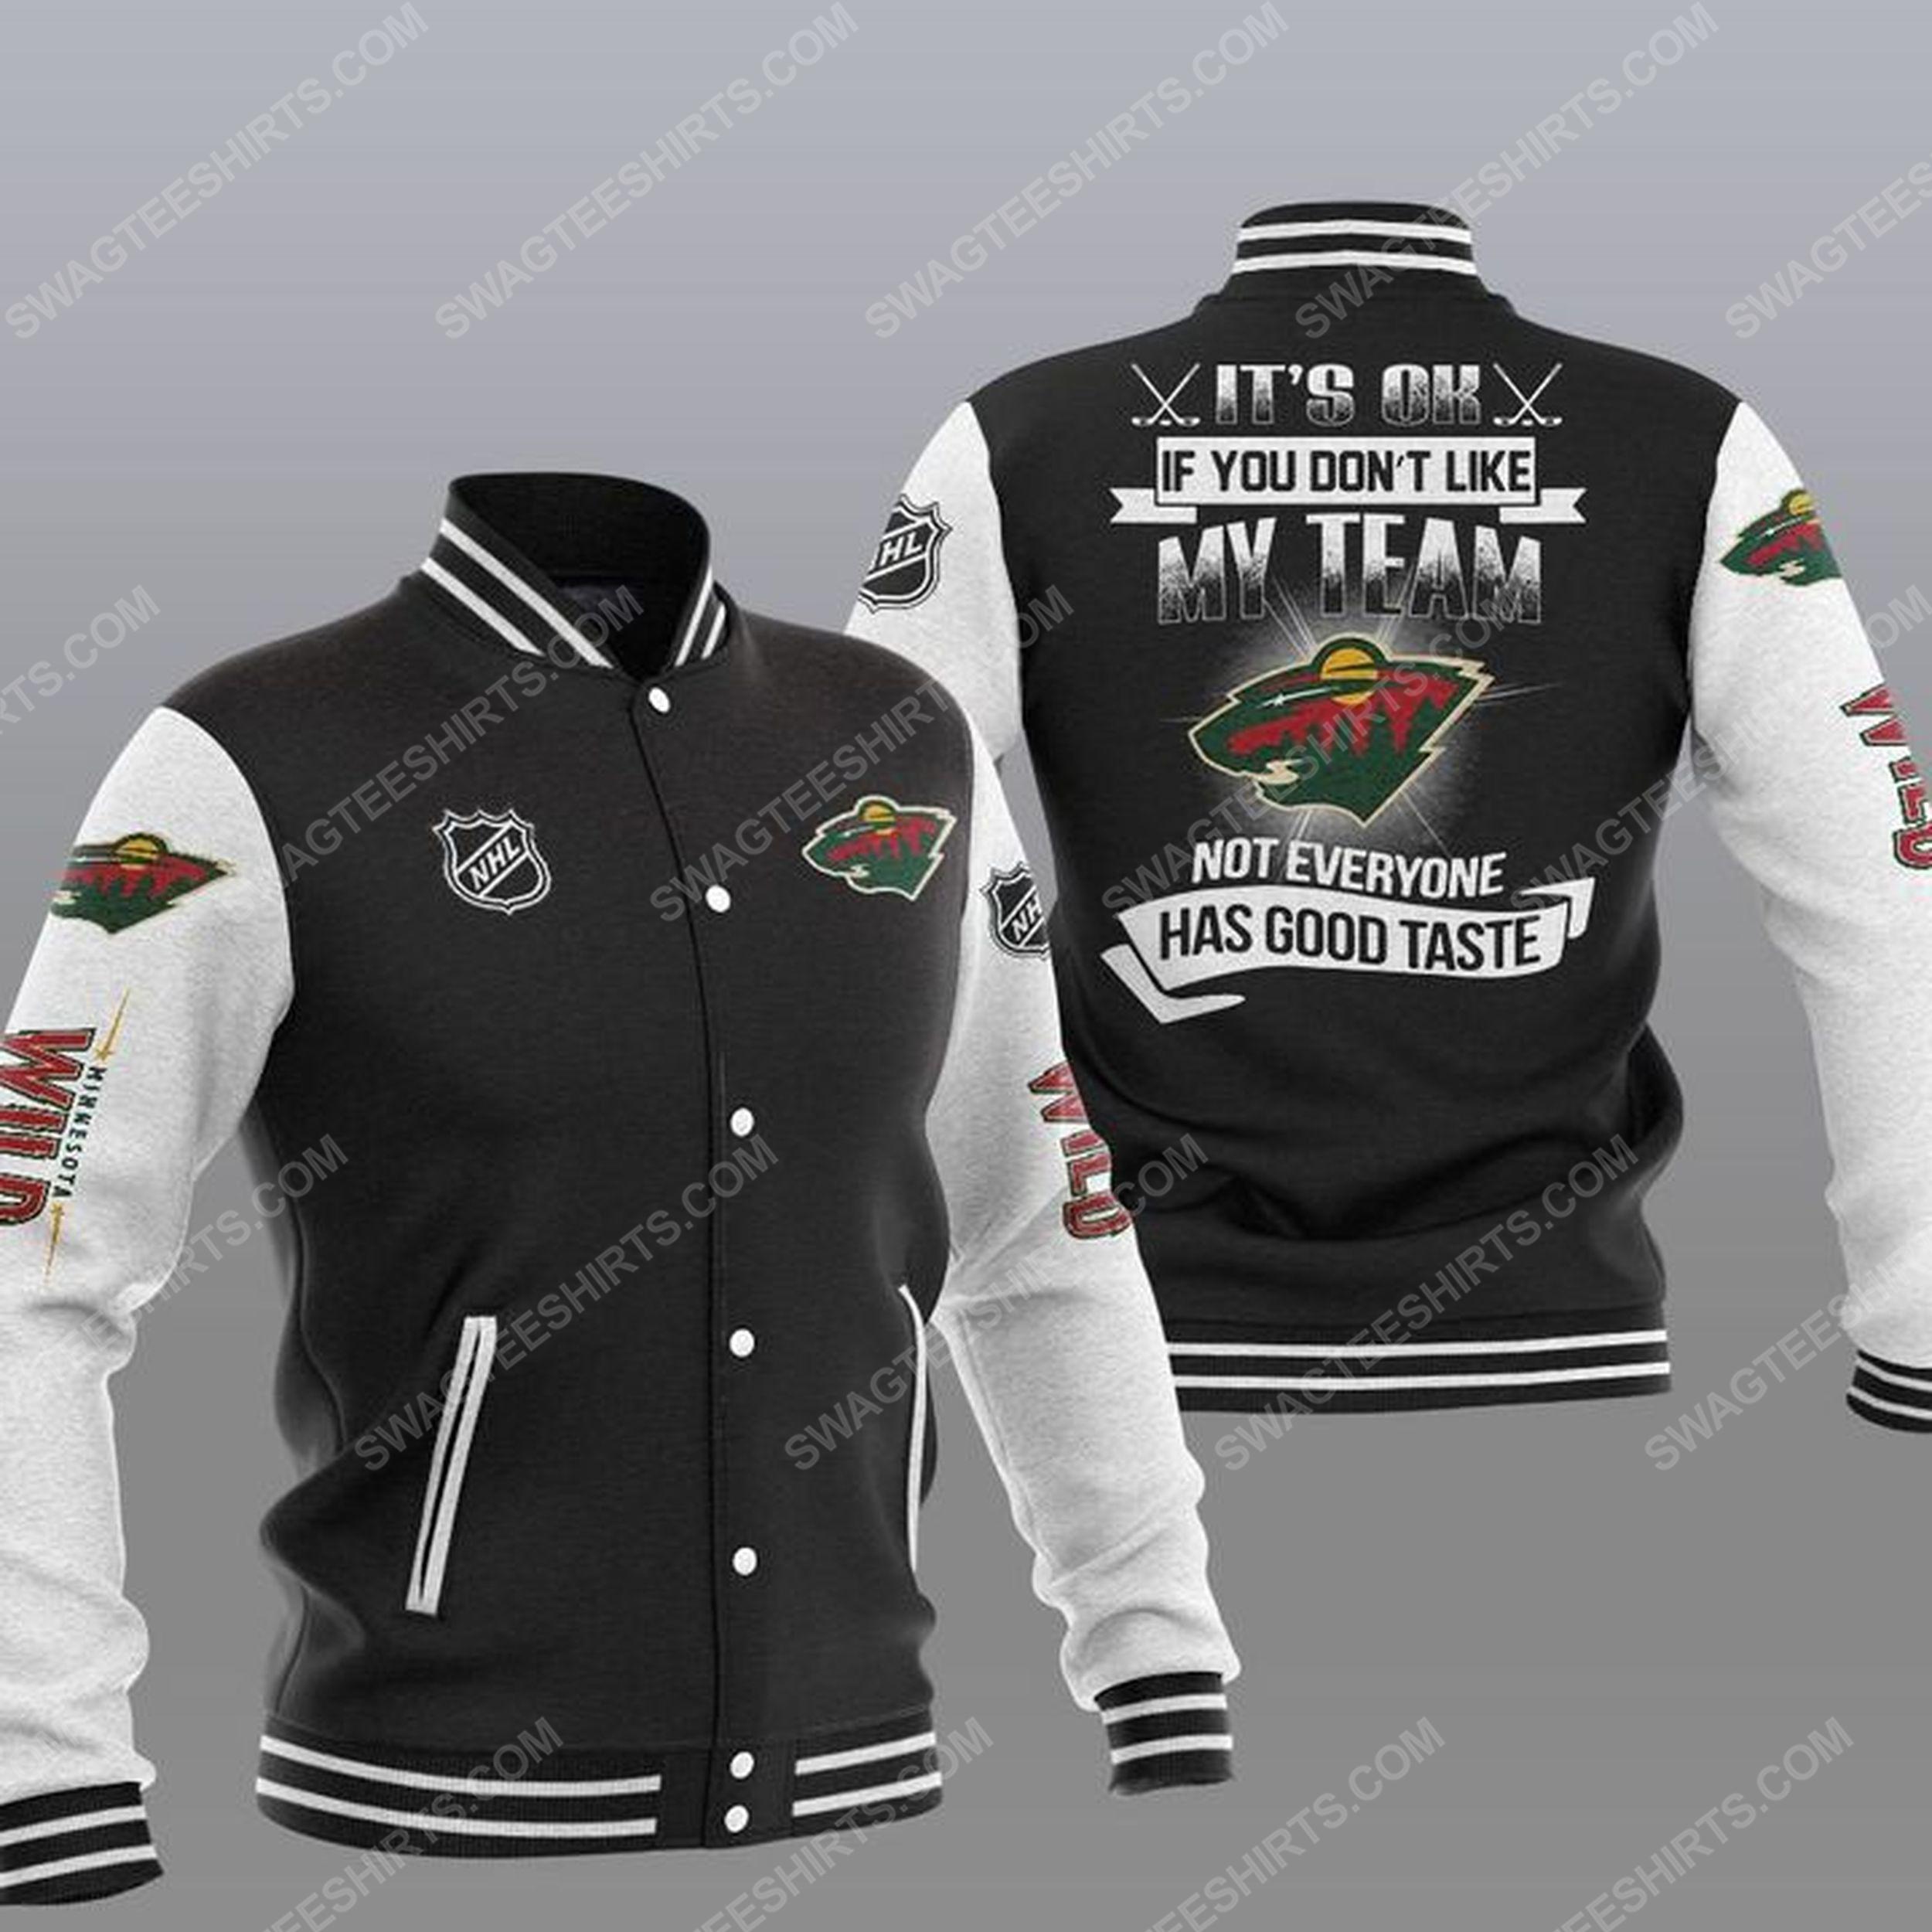 It's ok if you don't like my team minnesota wild all over print baseball jacket - black 1